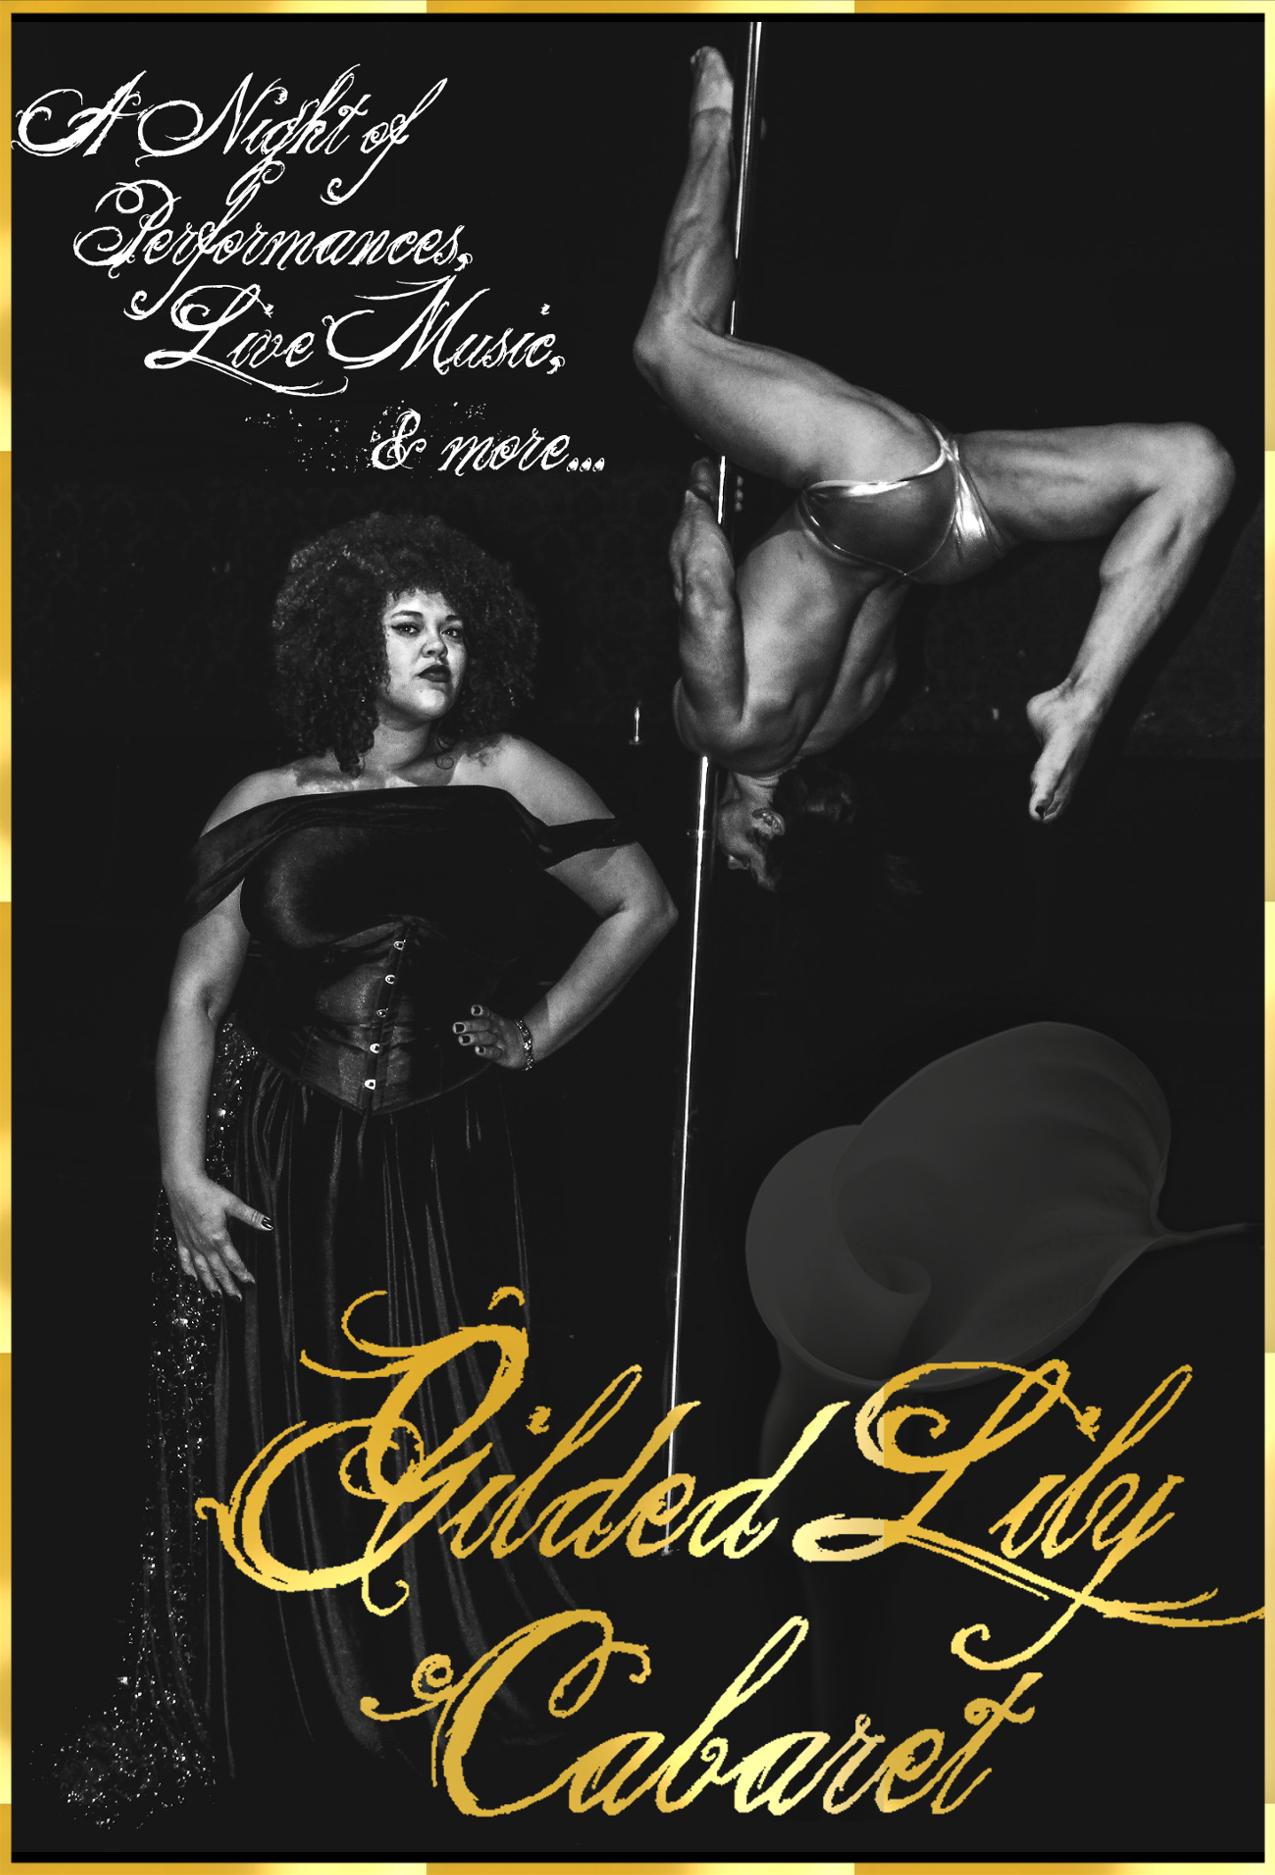 Gilded Lily Cabaret